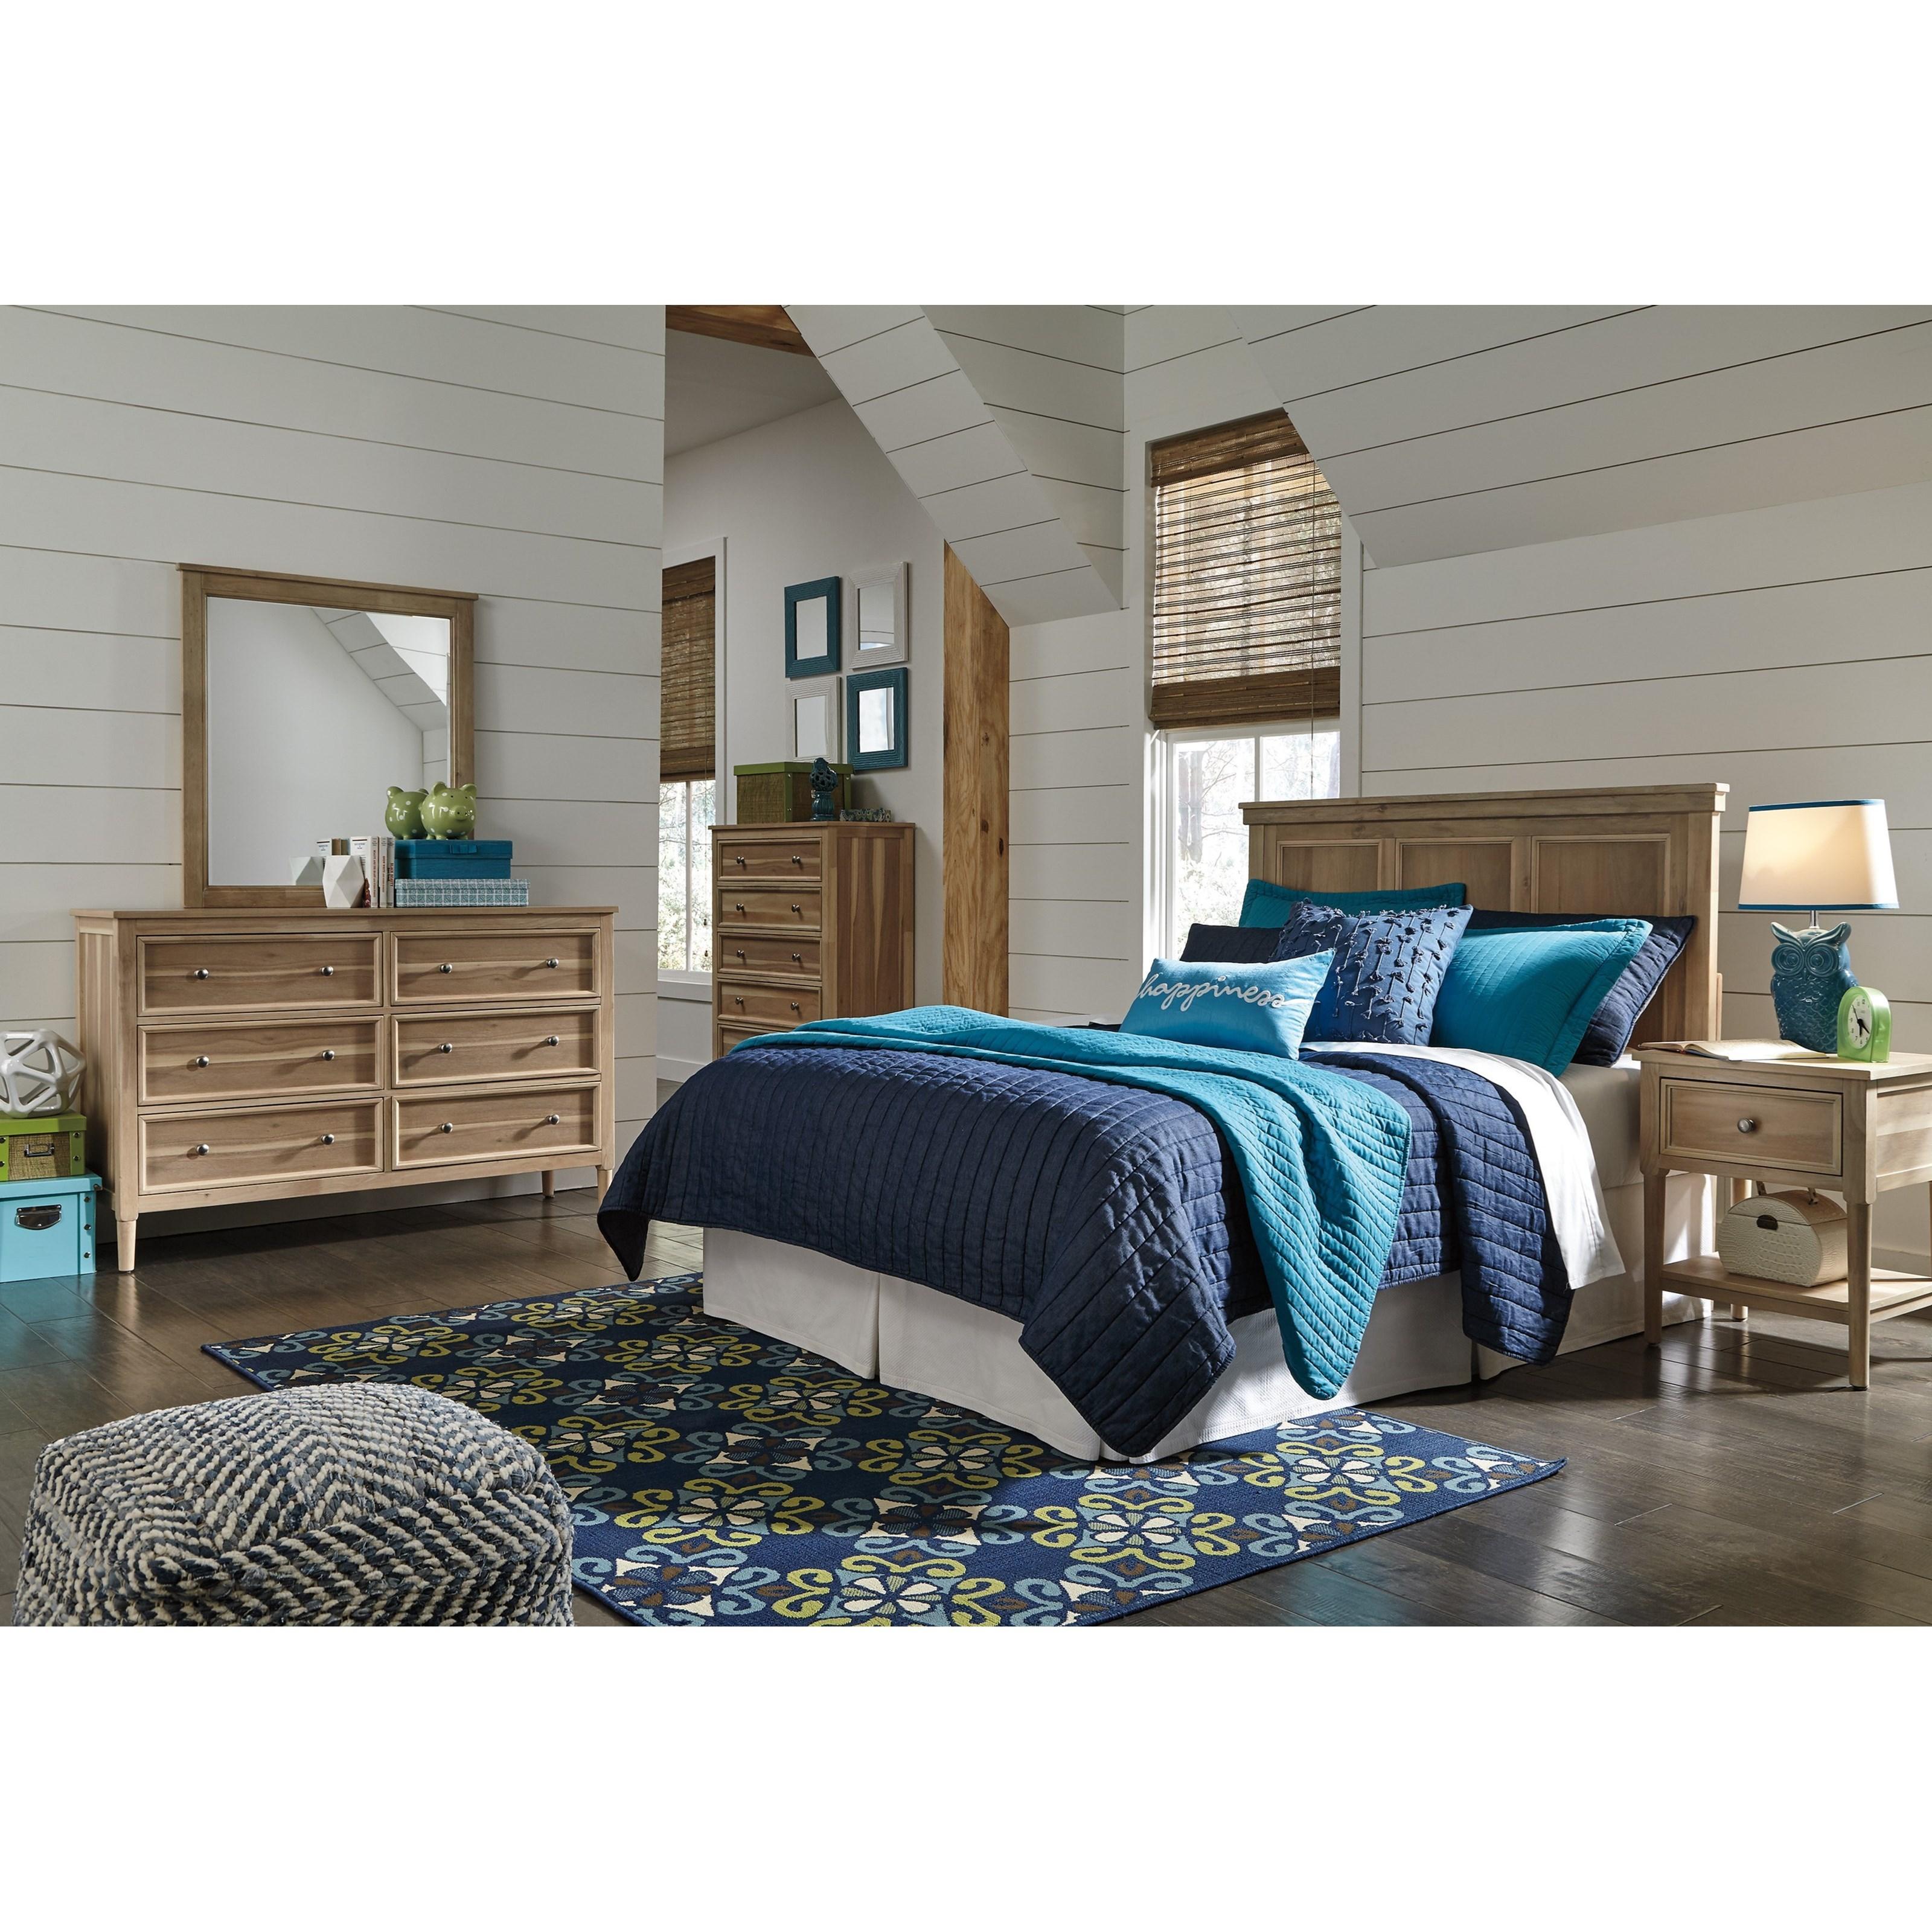 Signature Design By Ashley Klasholm Queen Bedroom Group Del Sol Furniture